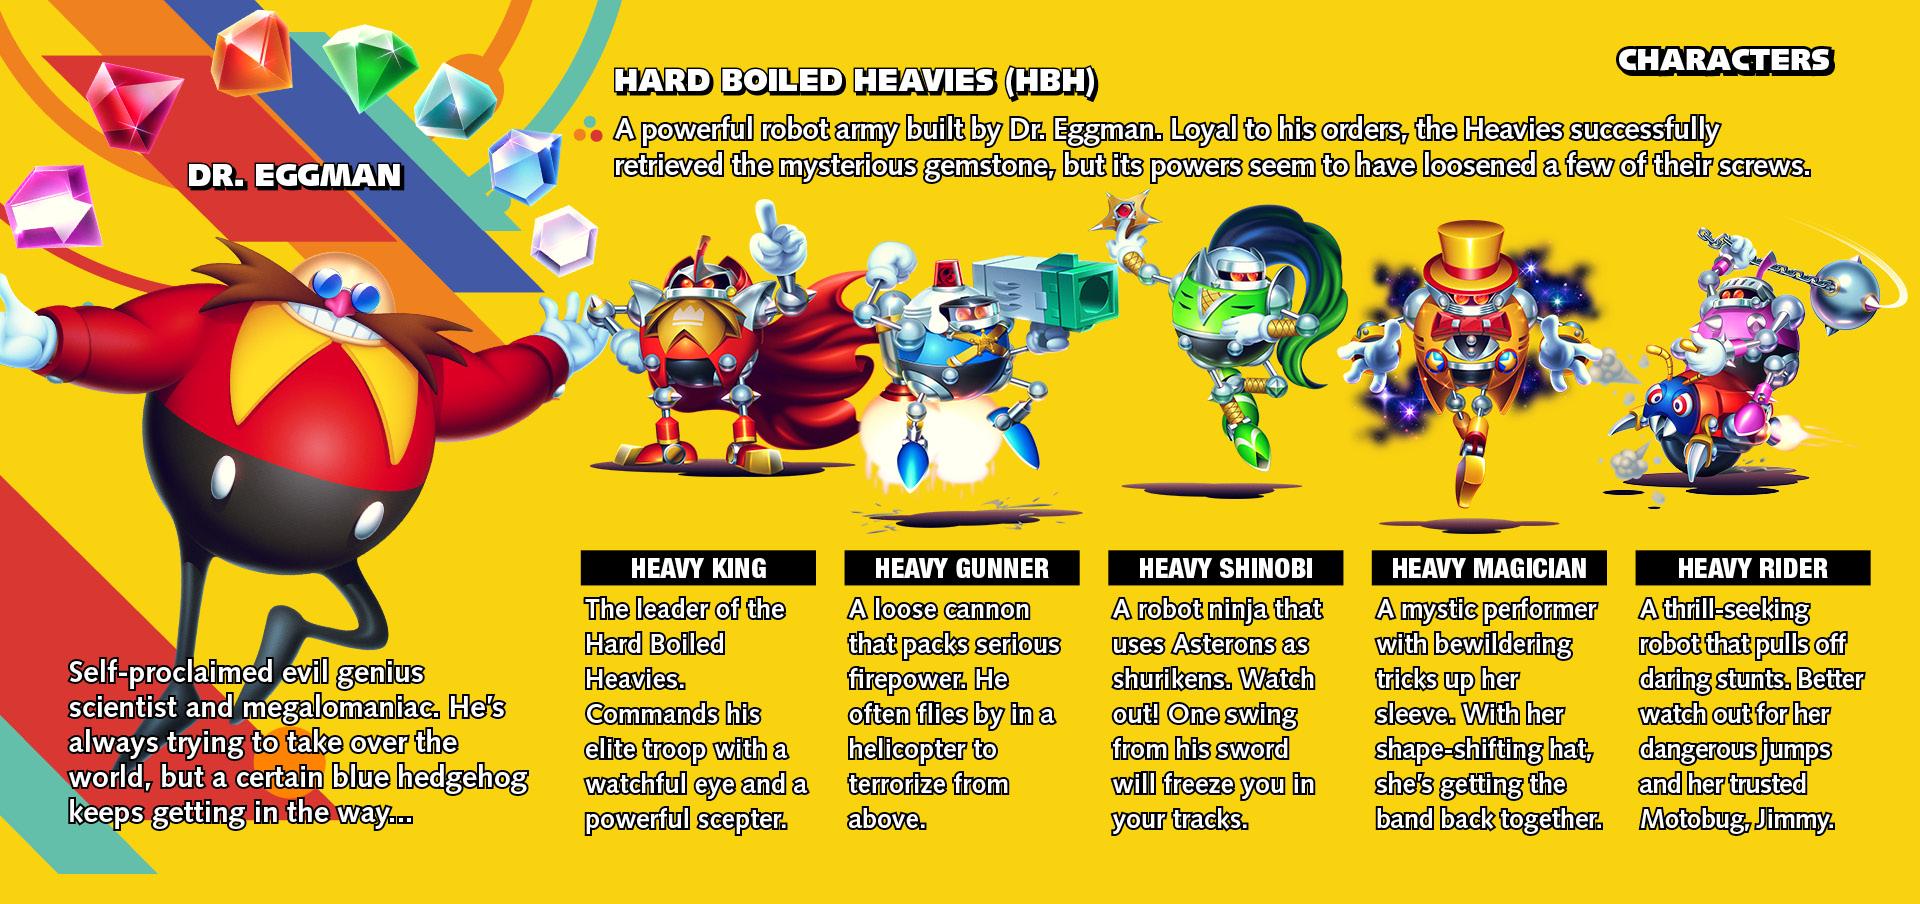 Imagen Hbh Jpg Sonic Wiki Fandom Powered By Wikia